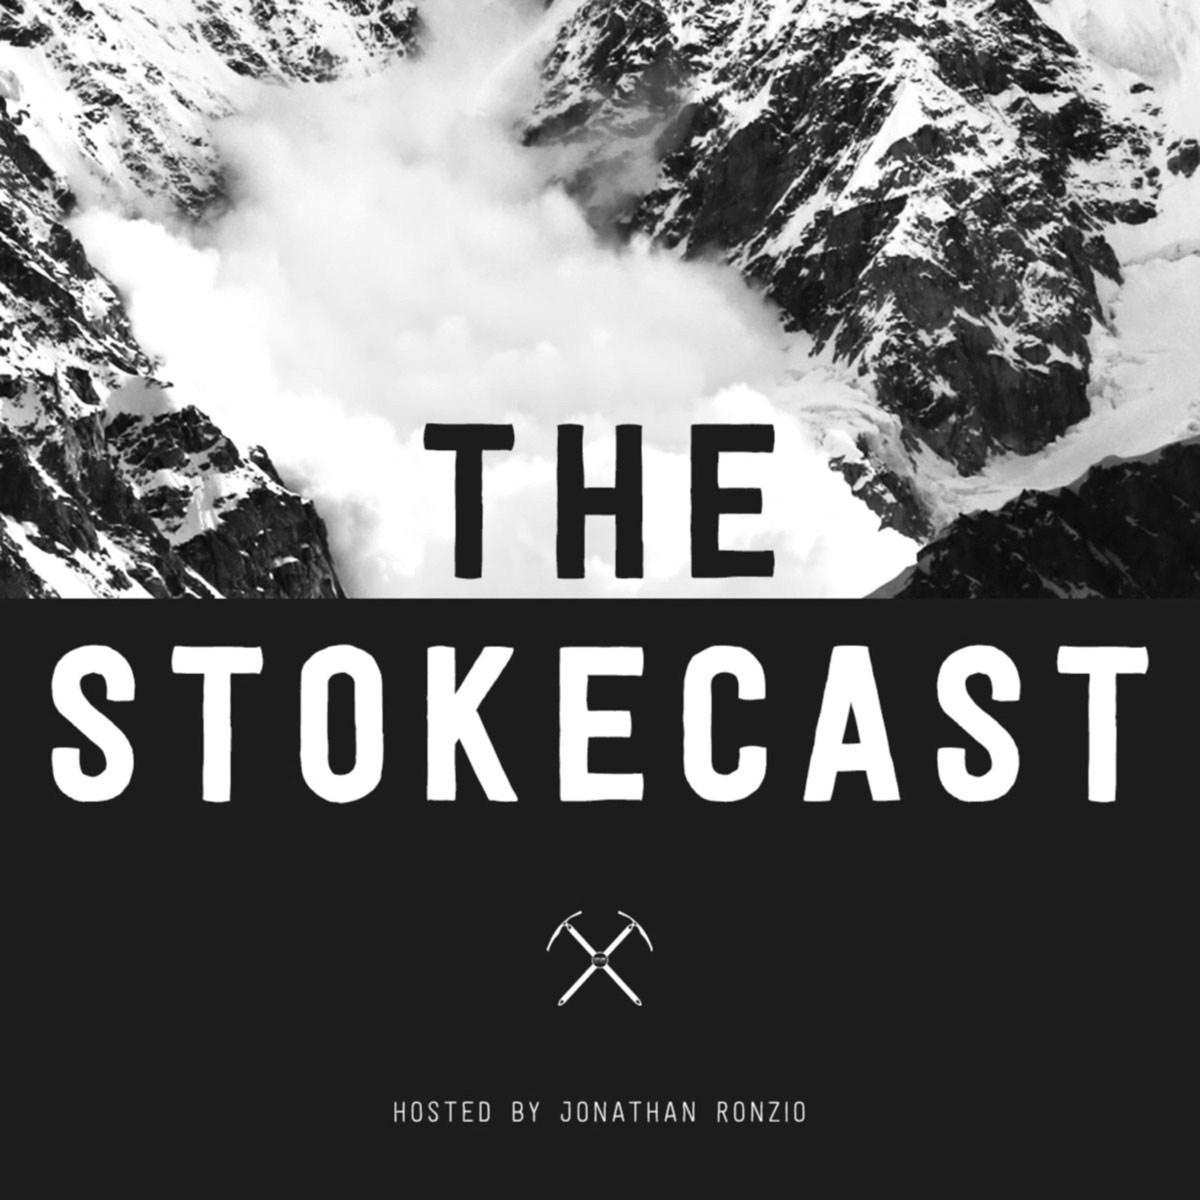 The Stokecast podcast artwork.